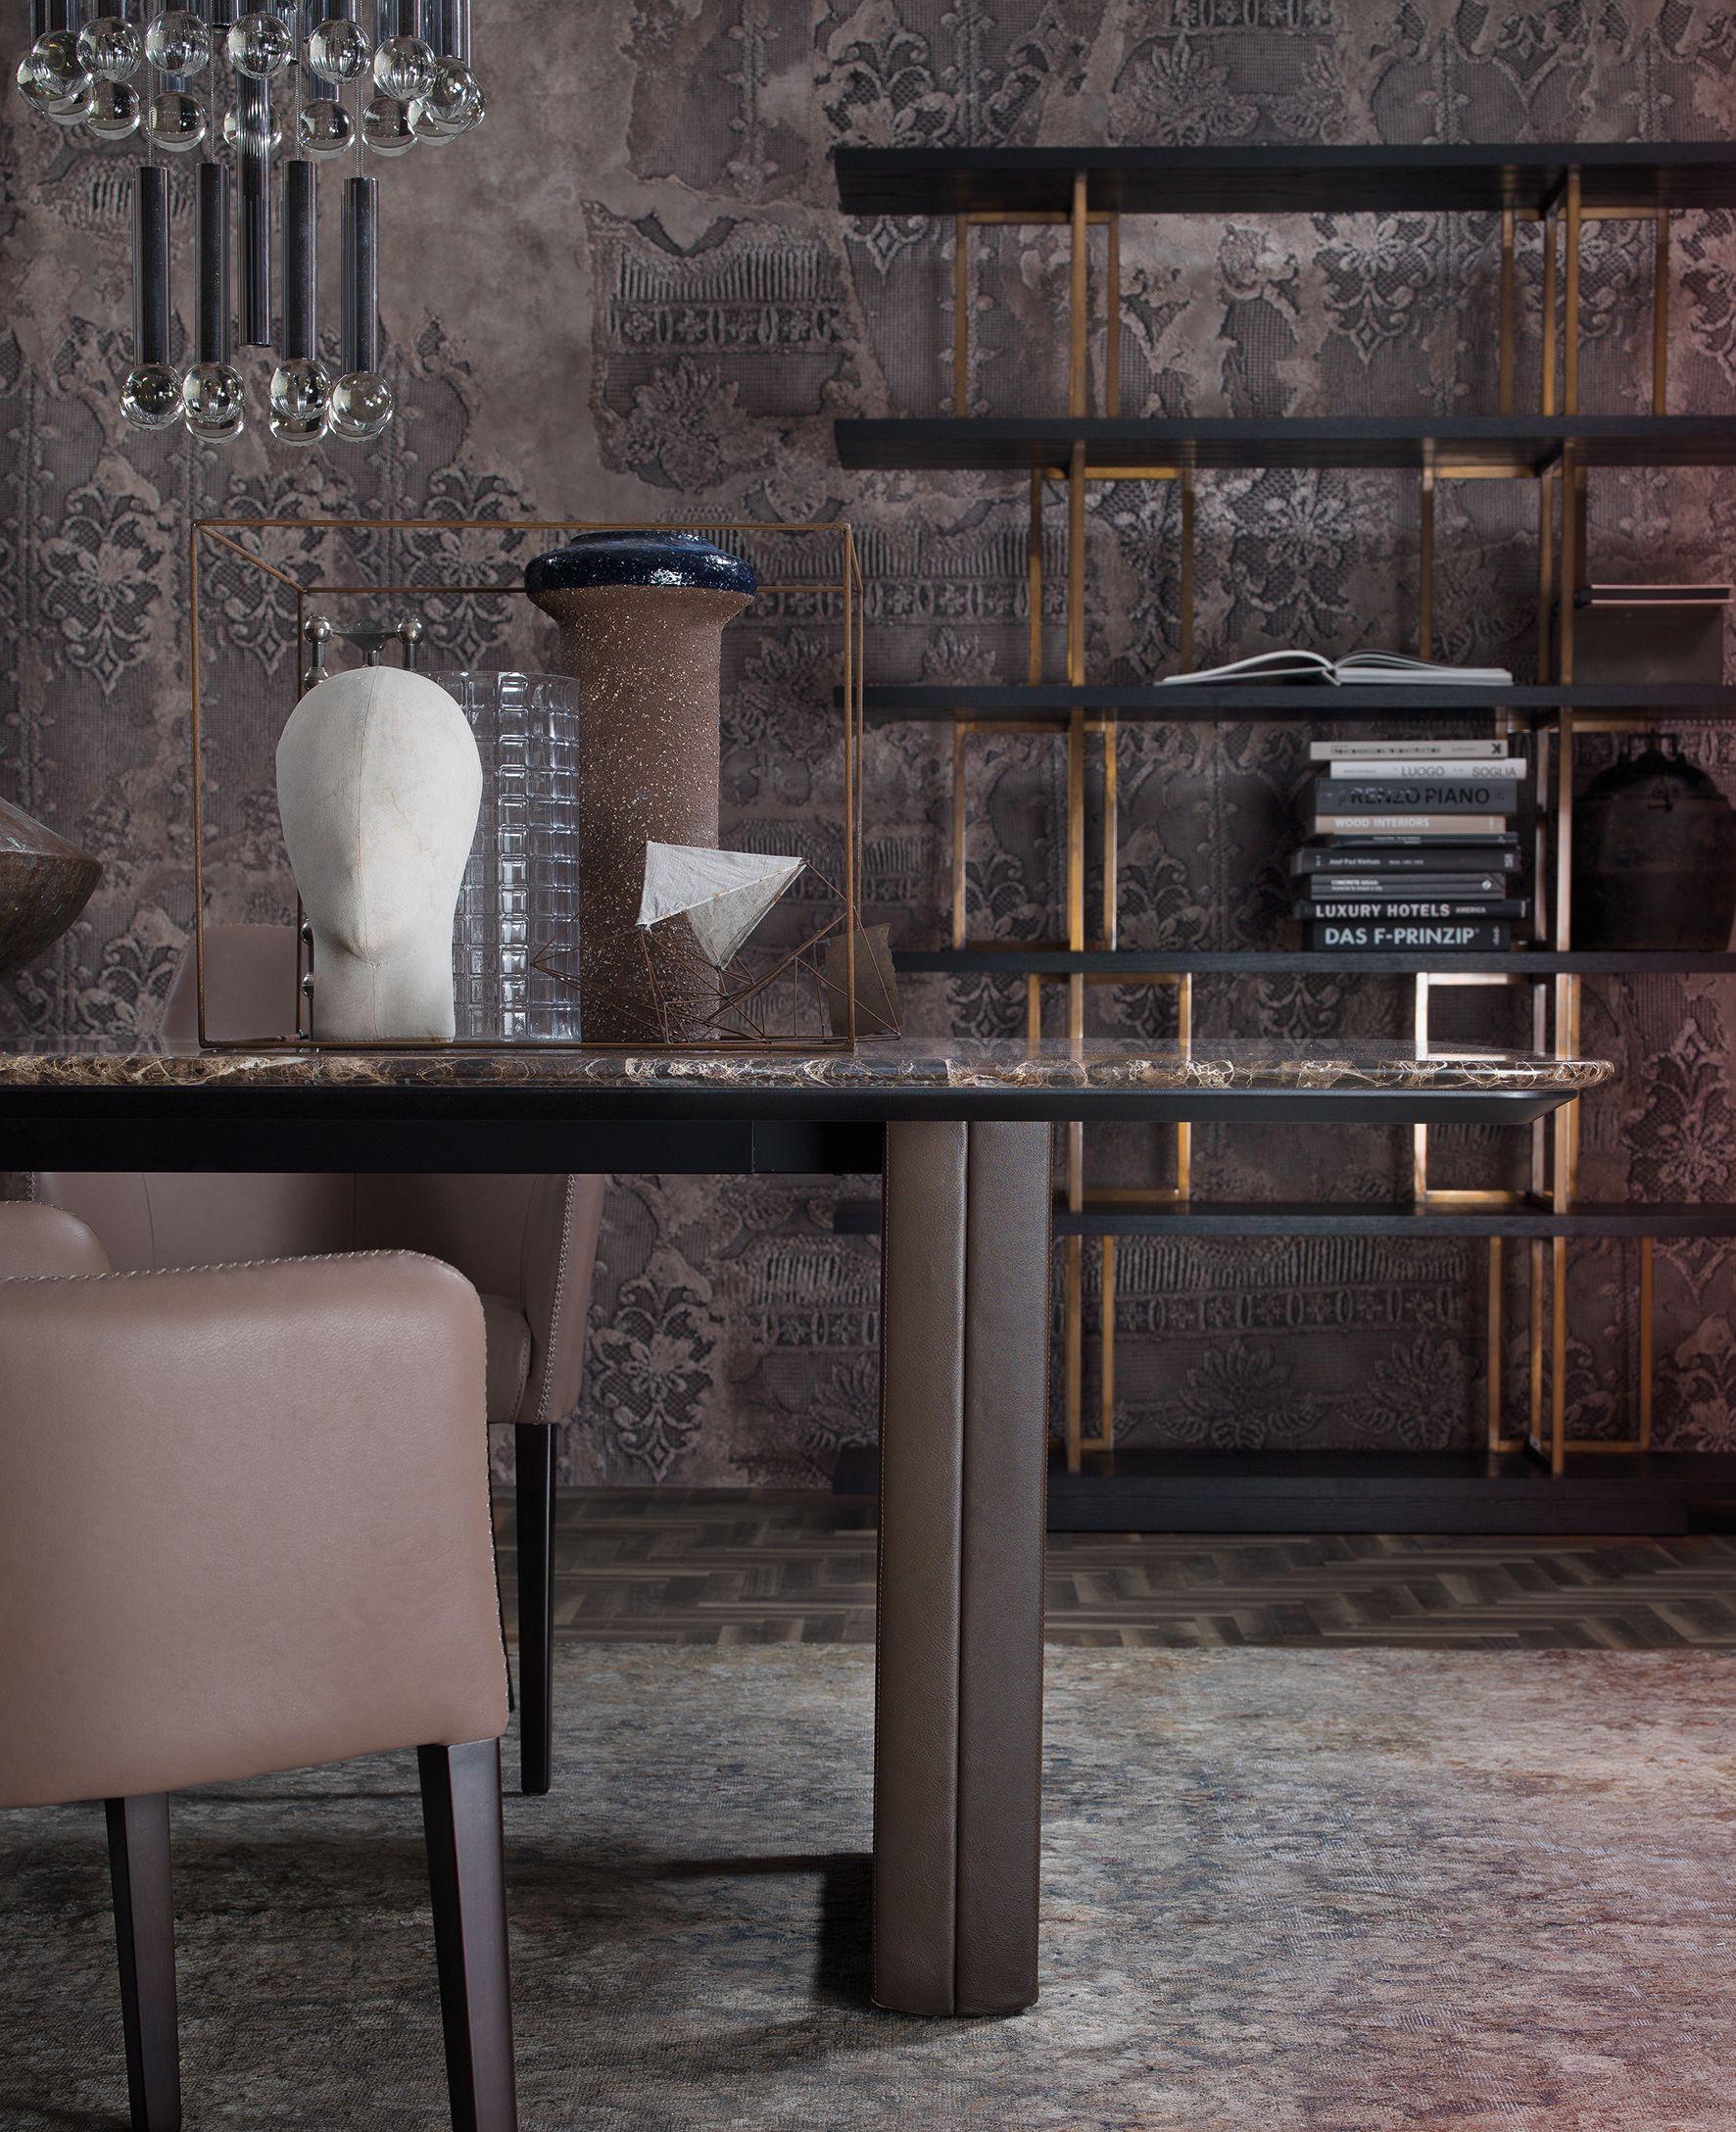 Pin By Wall Deco On Borzalino Catalogue Furniture Restoration Furniture Design Home Decor